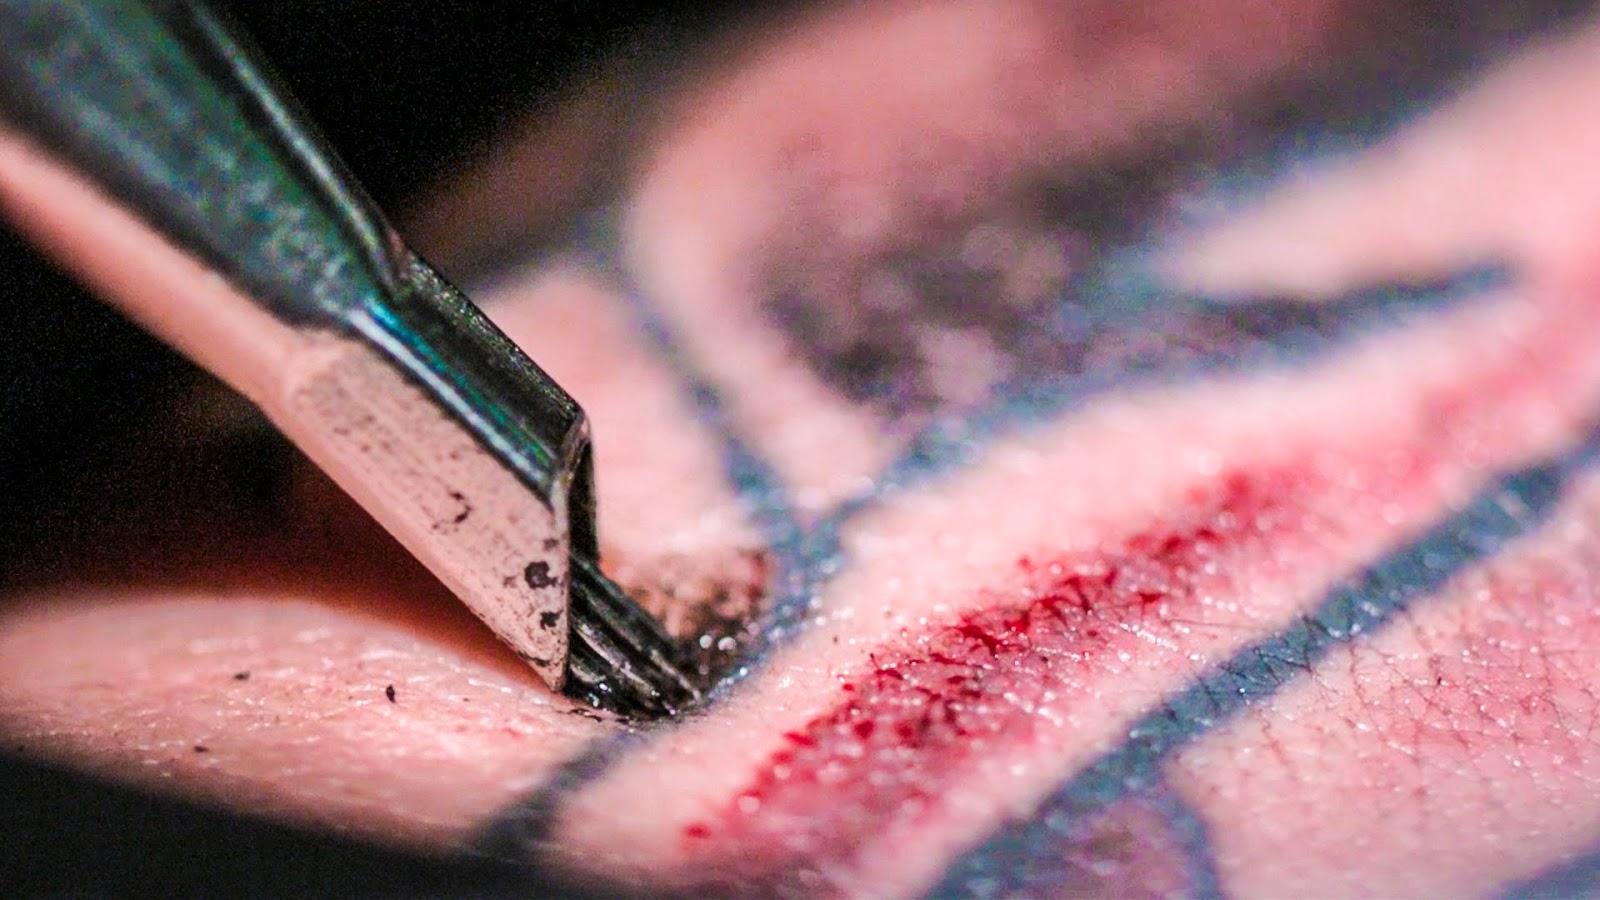 Son Los Tatuajes Malos Para La Salud 2019 Cortaporlosano